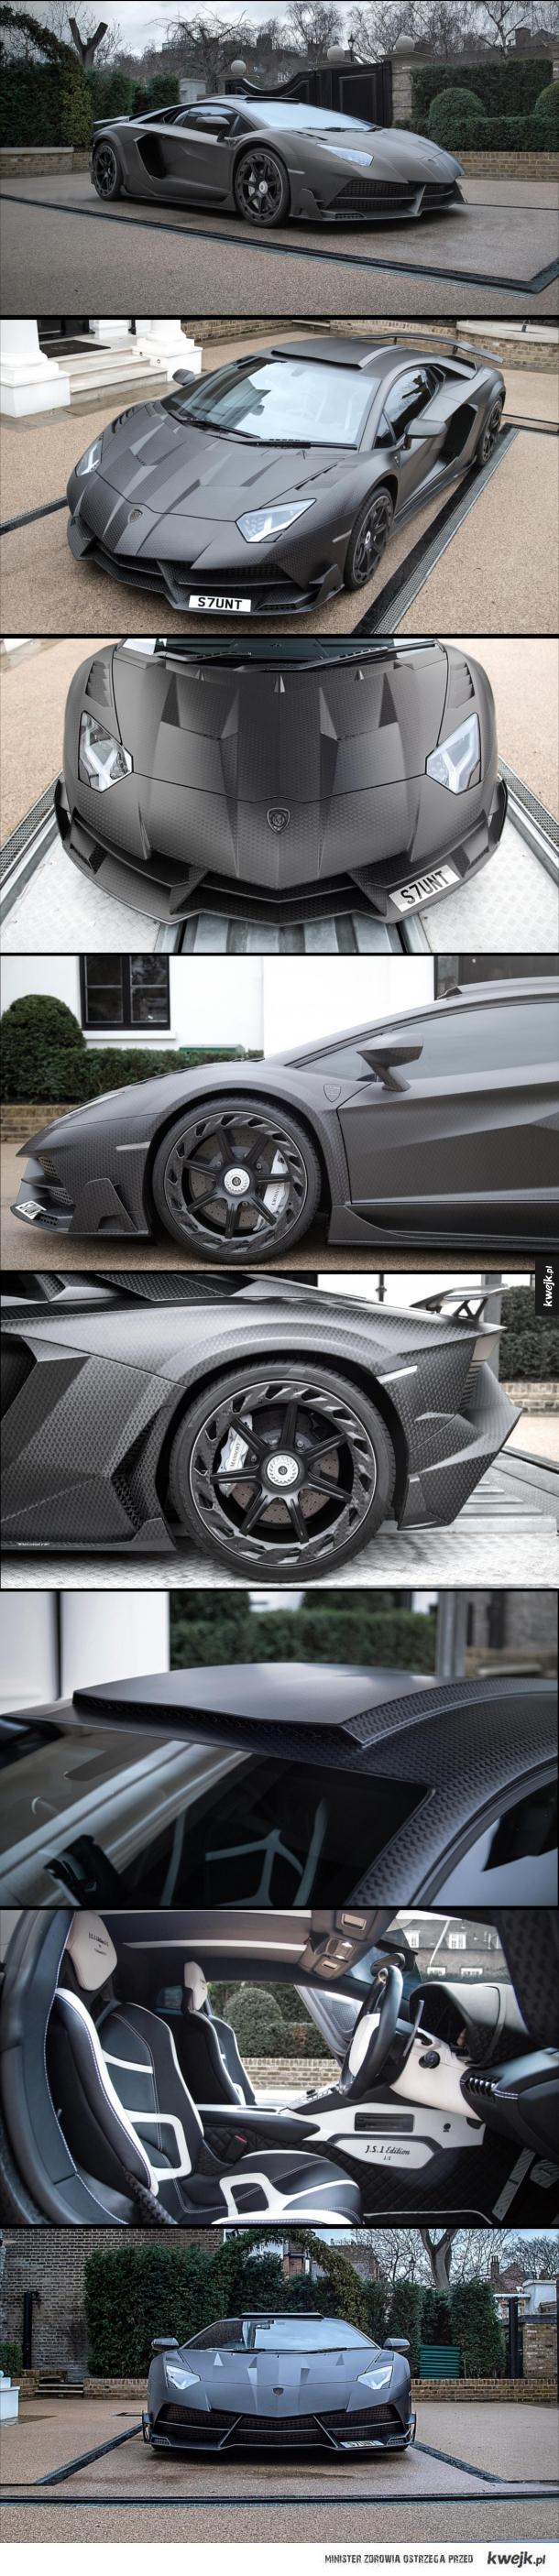 Lamborghini Aventador SV Mansory J.S. 1 Edition! o mocy 819 HP